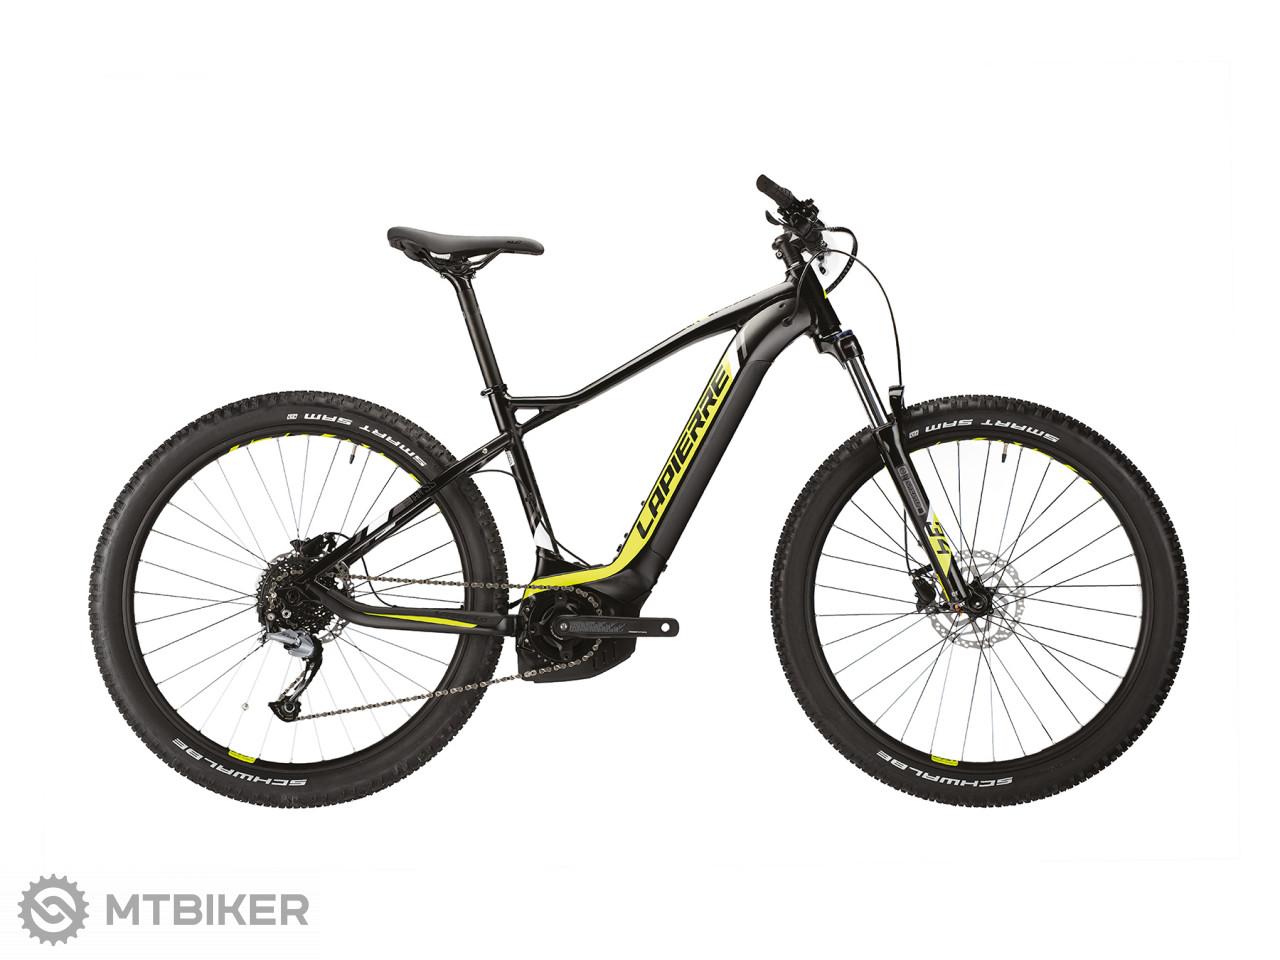 Lapierre Overvolt HT 5.4 Y400, model 2021